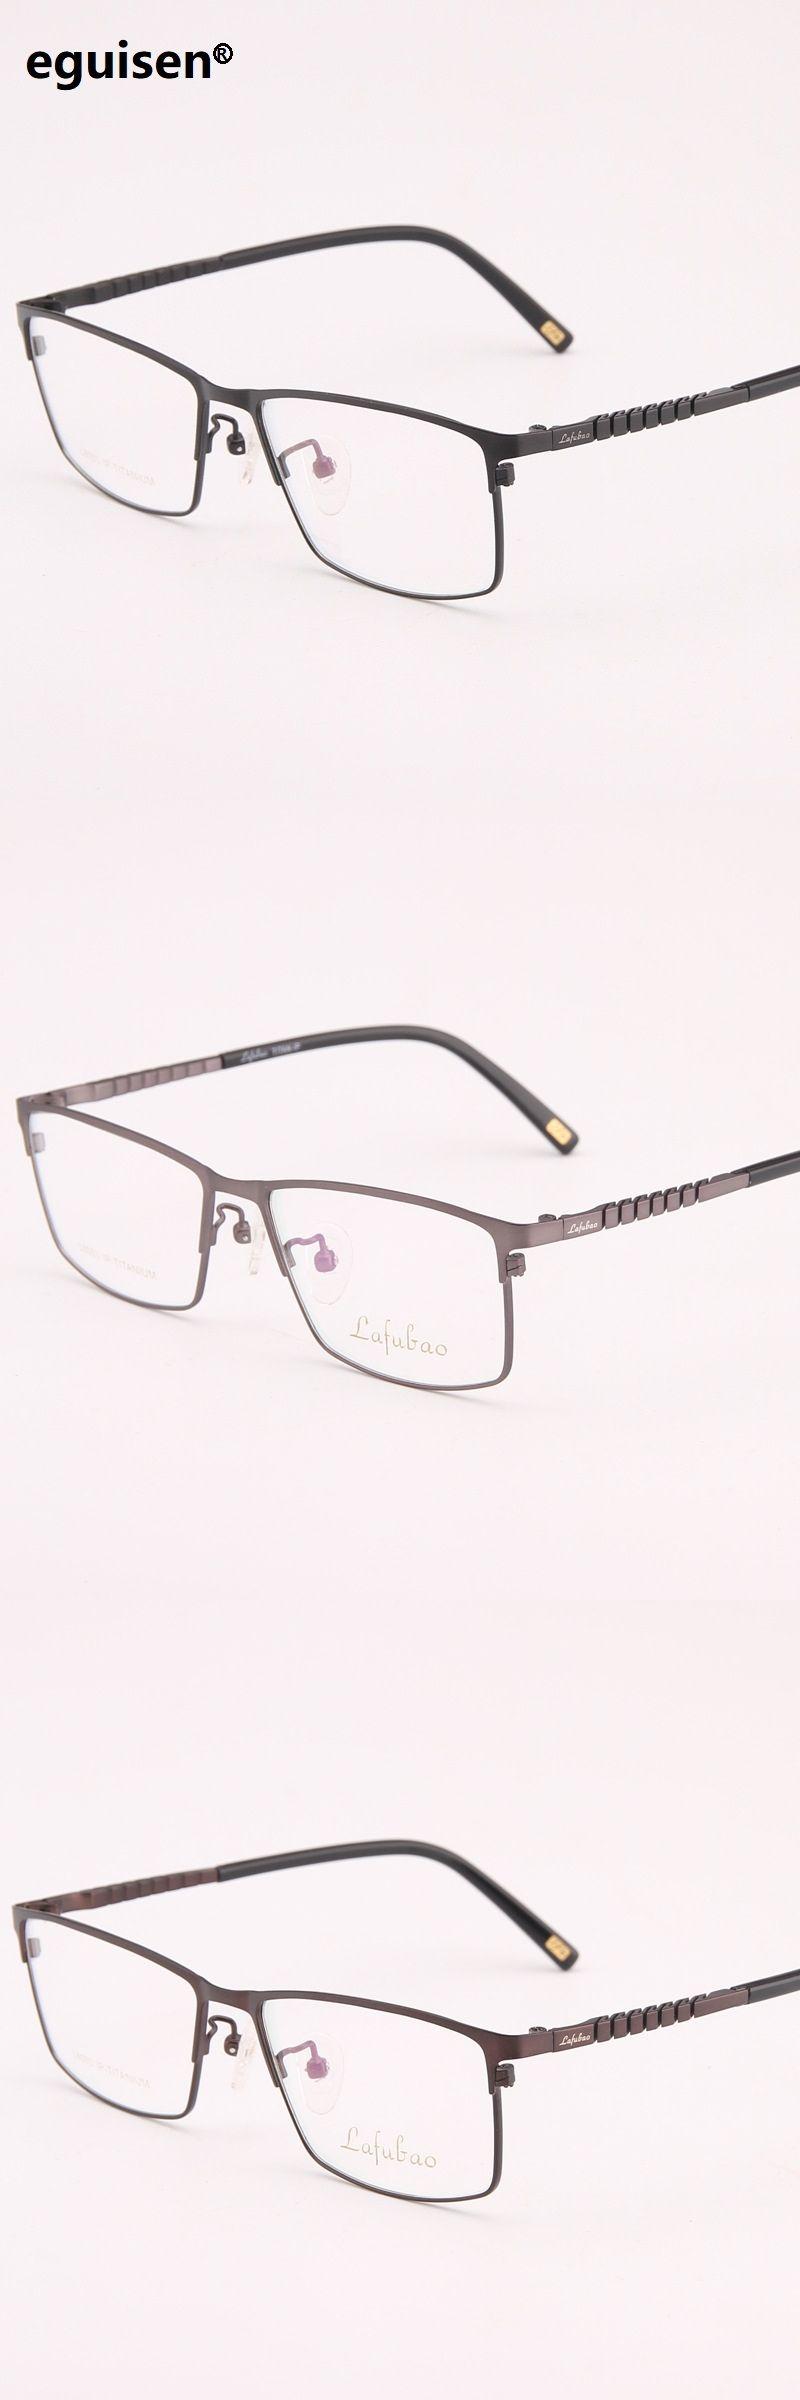 95b1e4c12be 54-16-135 Pure titanium super lightweight deformation business full frame  titanium plate eyerglasses